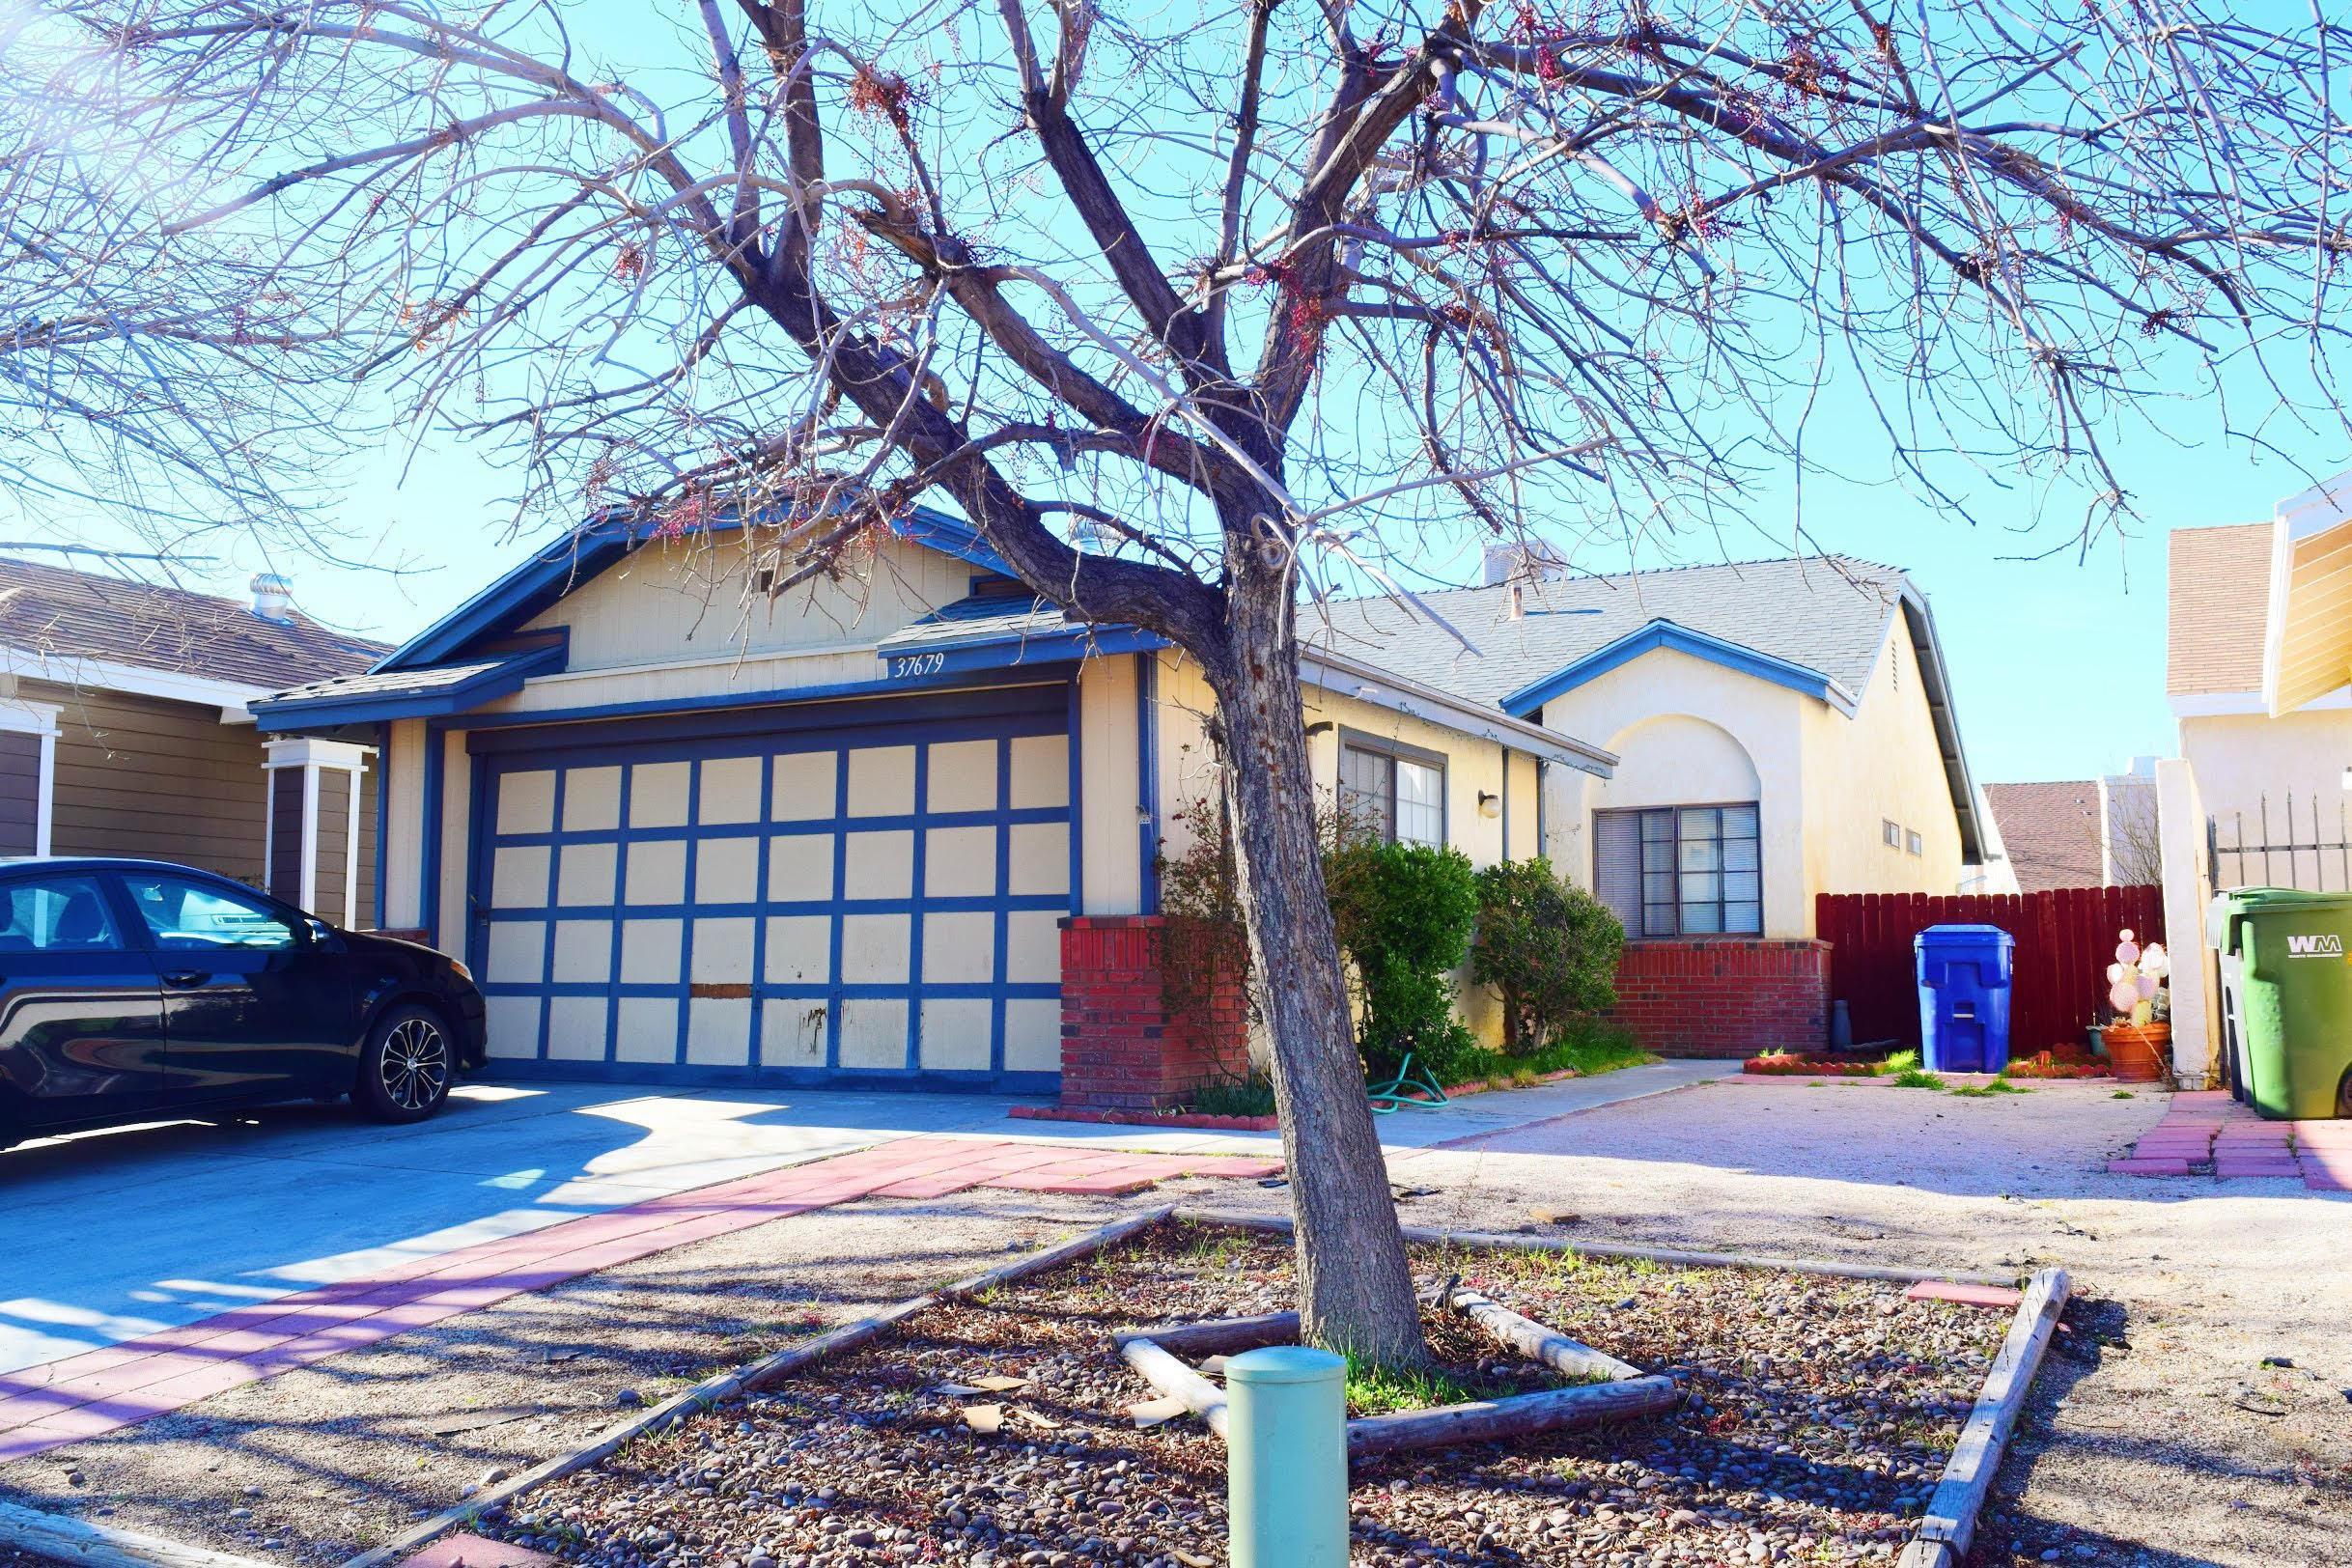 37679  Lasker Avenue, Palmdale, California